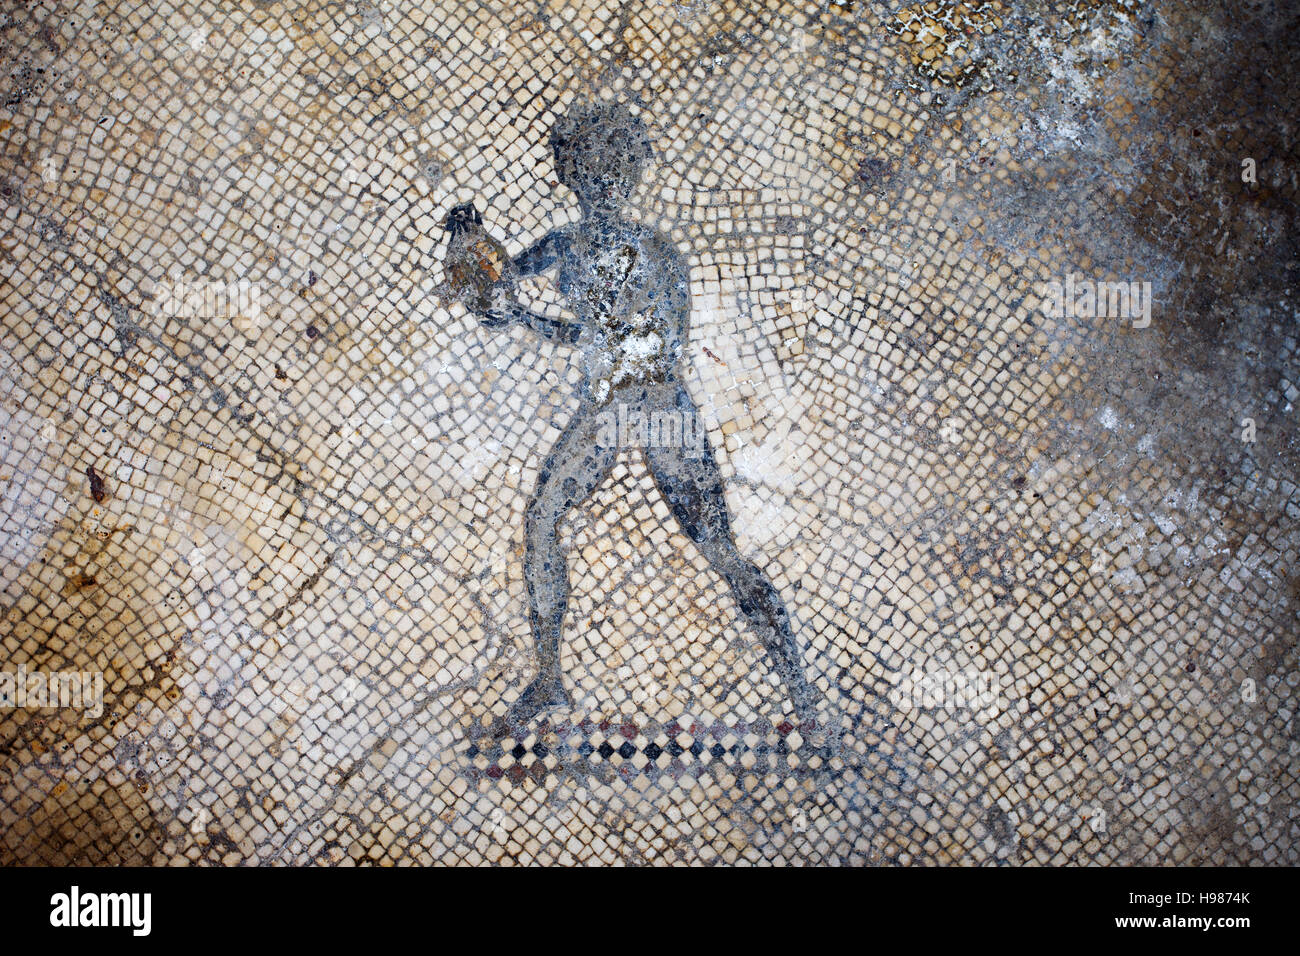 Casa & Co Milazzo page 2 - roman mosaic pavement high resolution stock